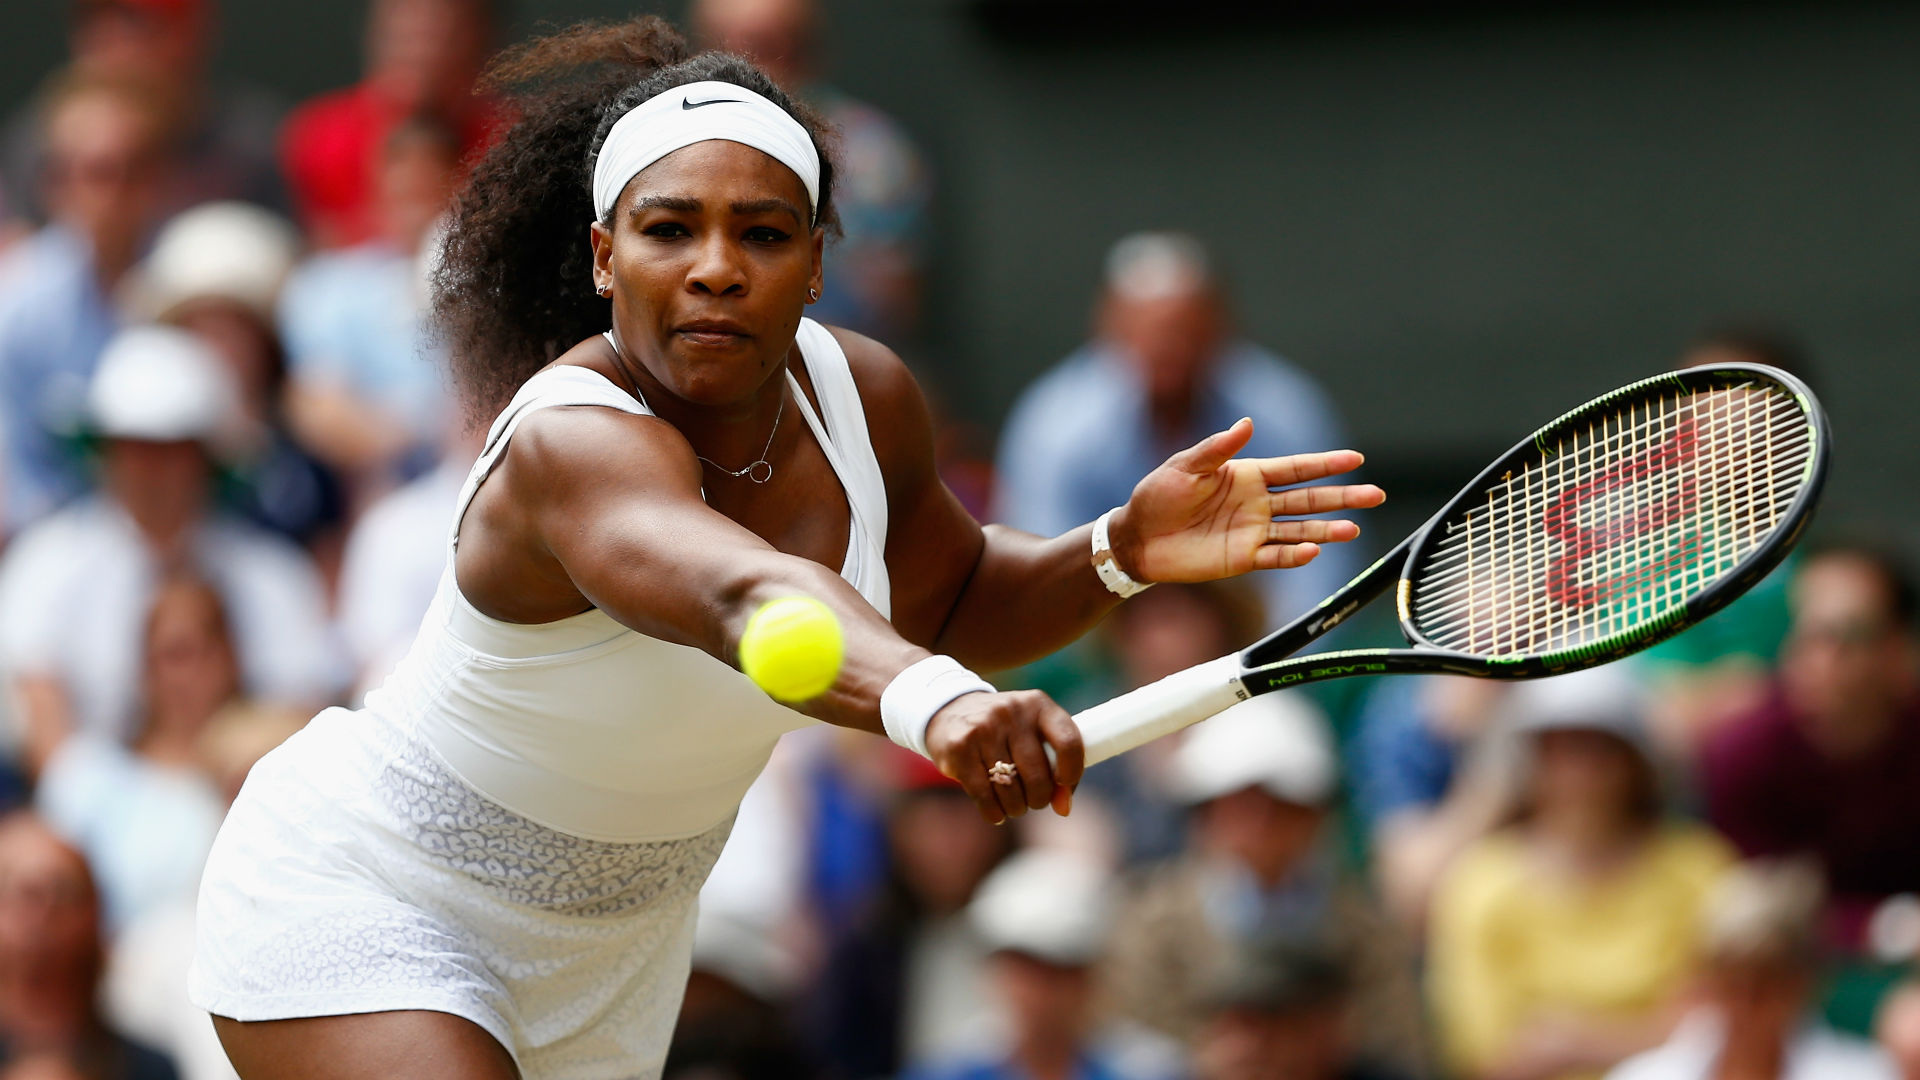 Serena Williams-070615-Getty-FTR.jpg